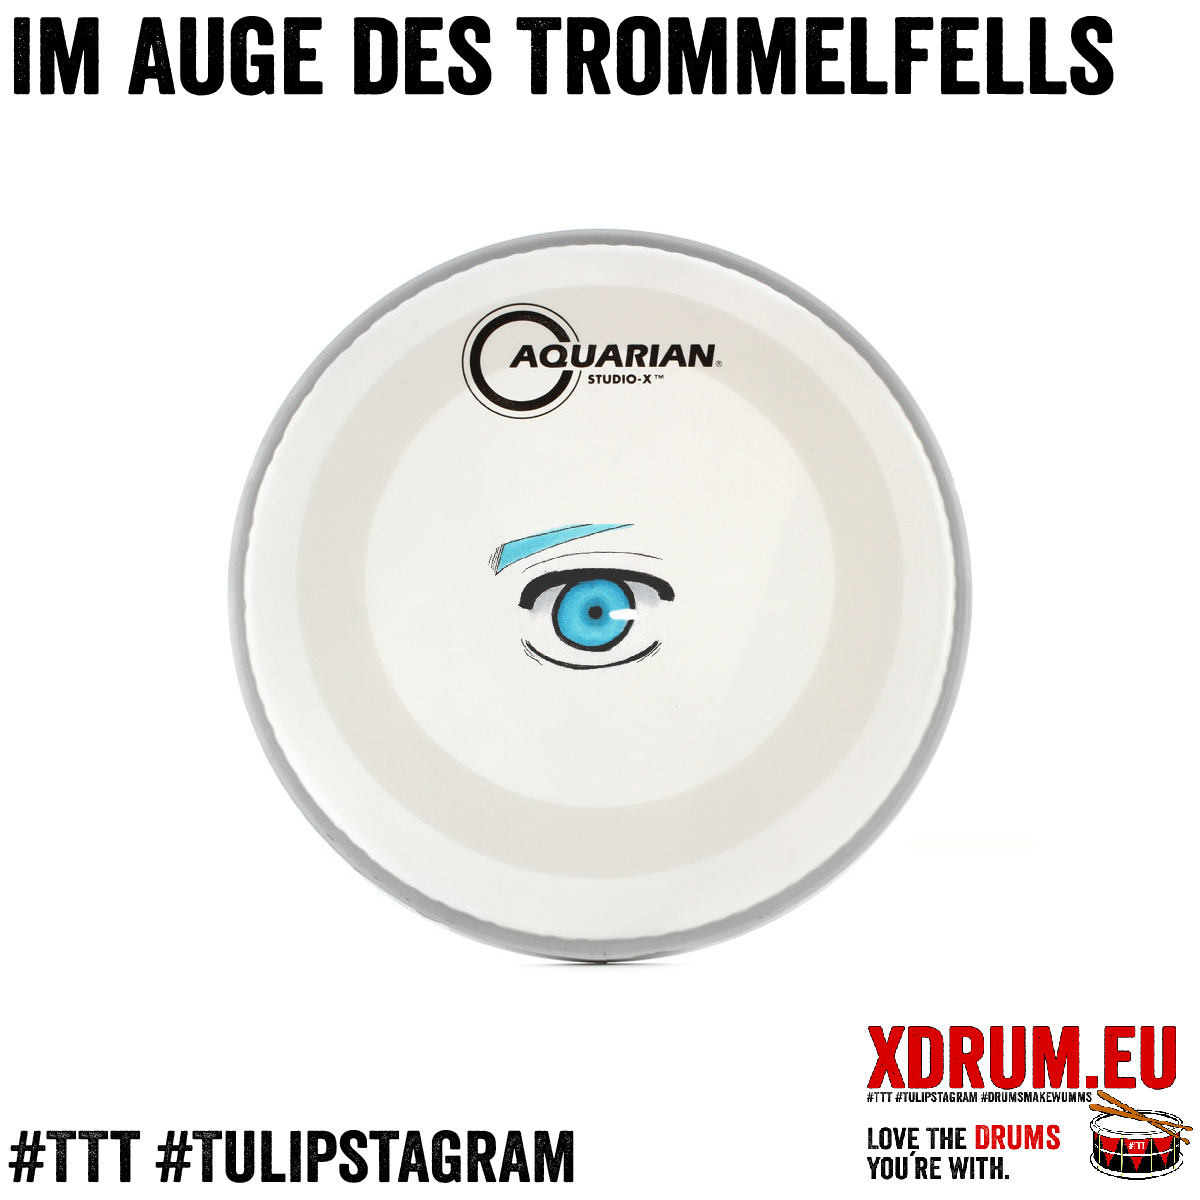 Im Auge des Trommelfells #TTT #Tulipstagram #ImAugedesTrommelfells #DrumsmakeWumms